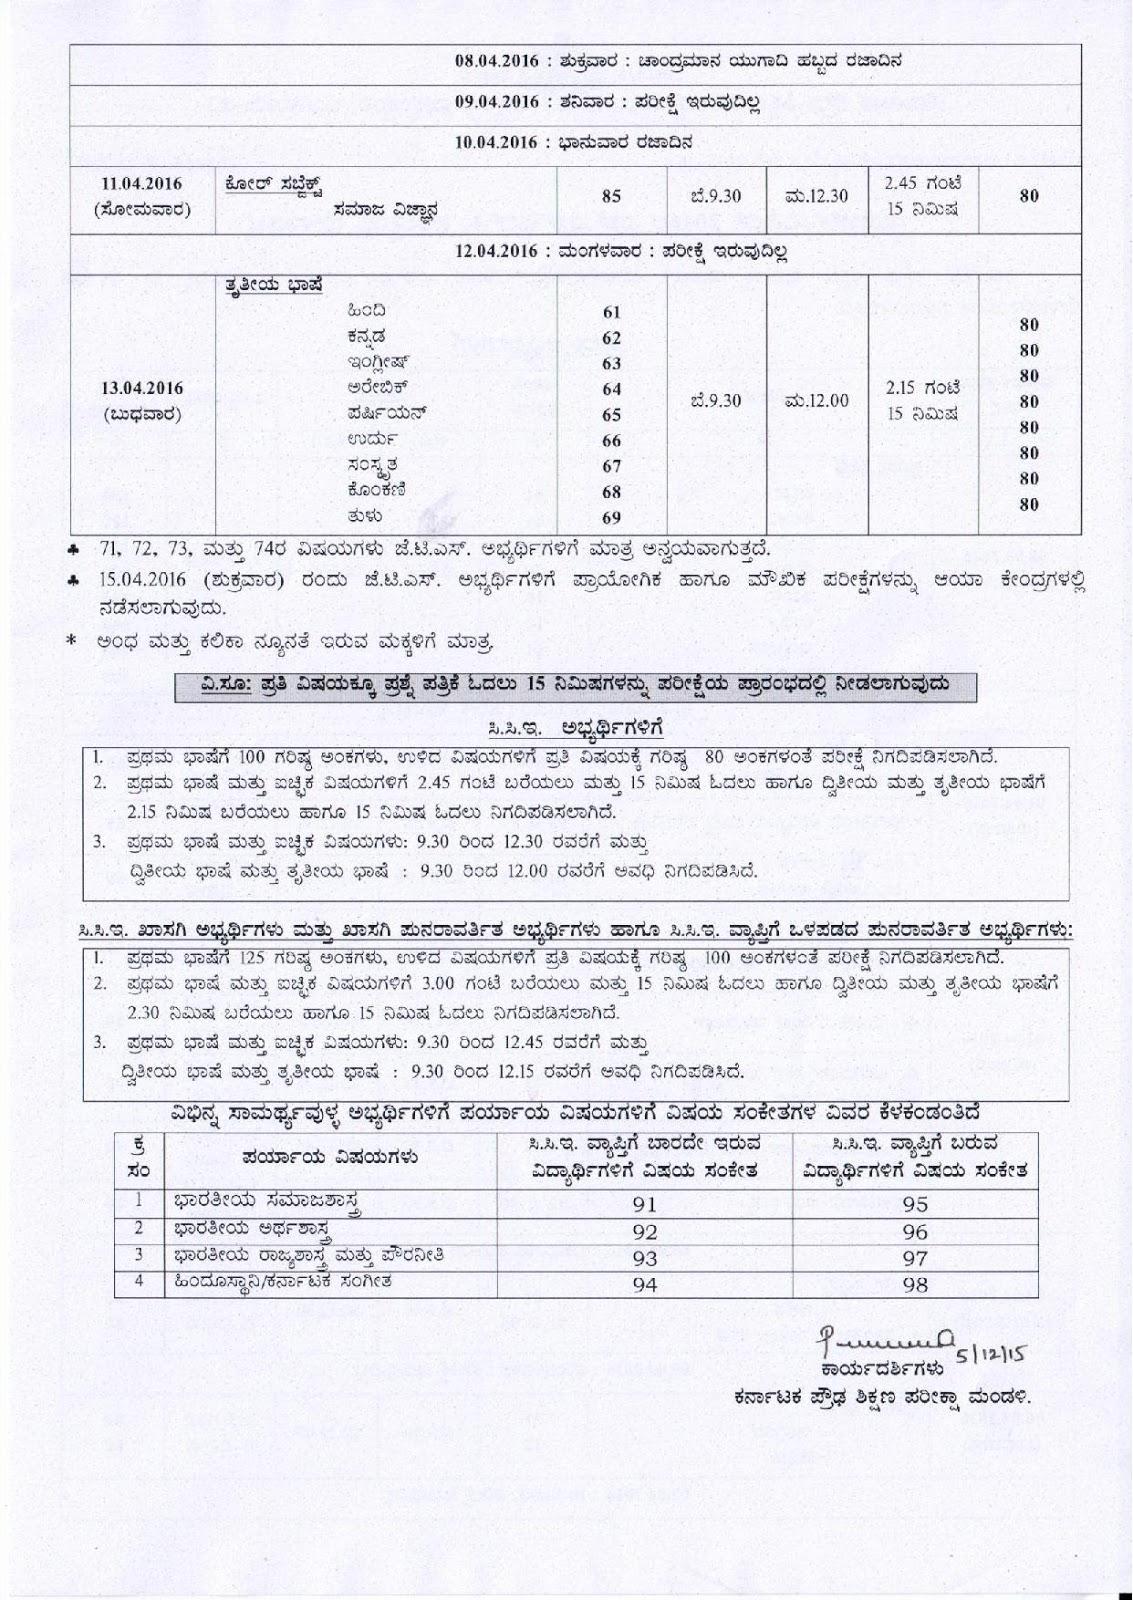 Karnataka board sslc time table 2016 marchapril karnataka karnataka board sslc time table 2016 marchapril malvernweather Images